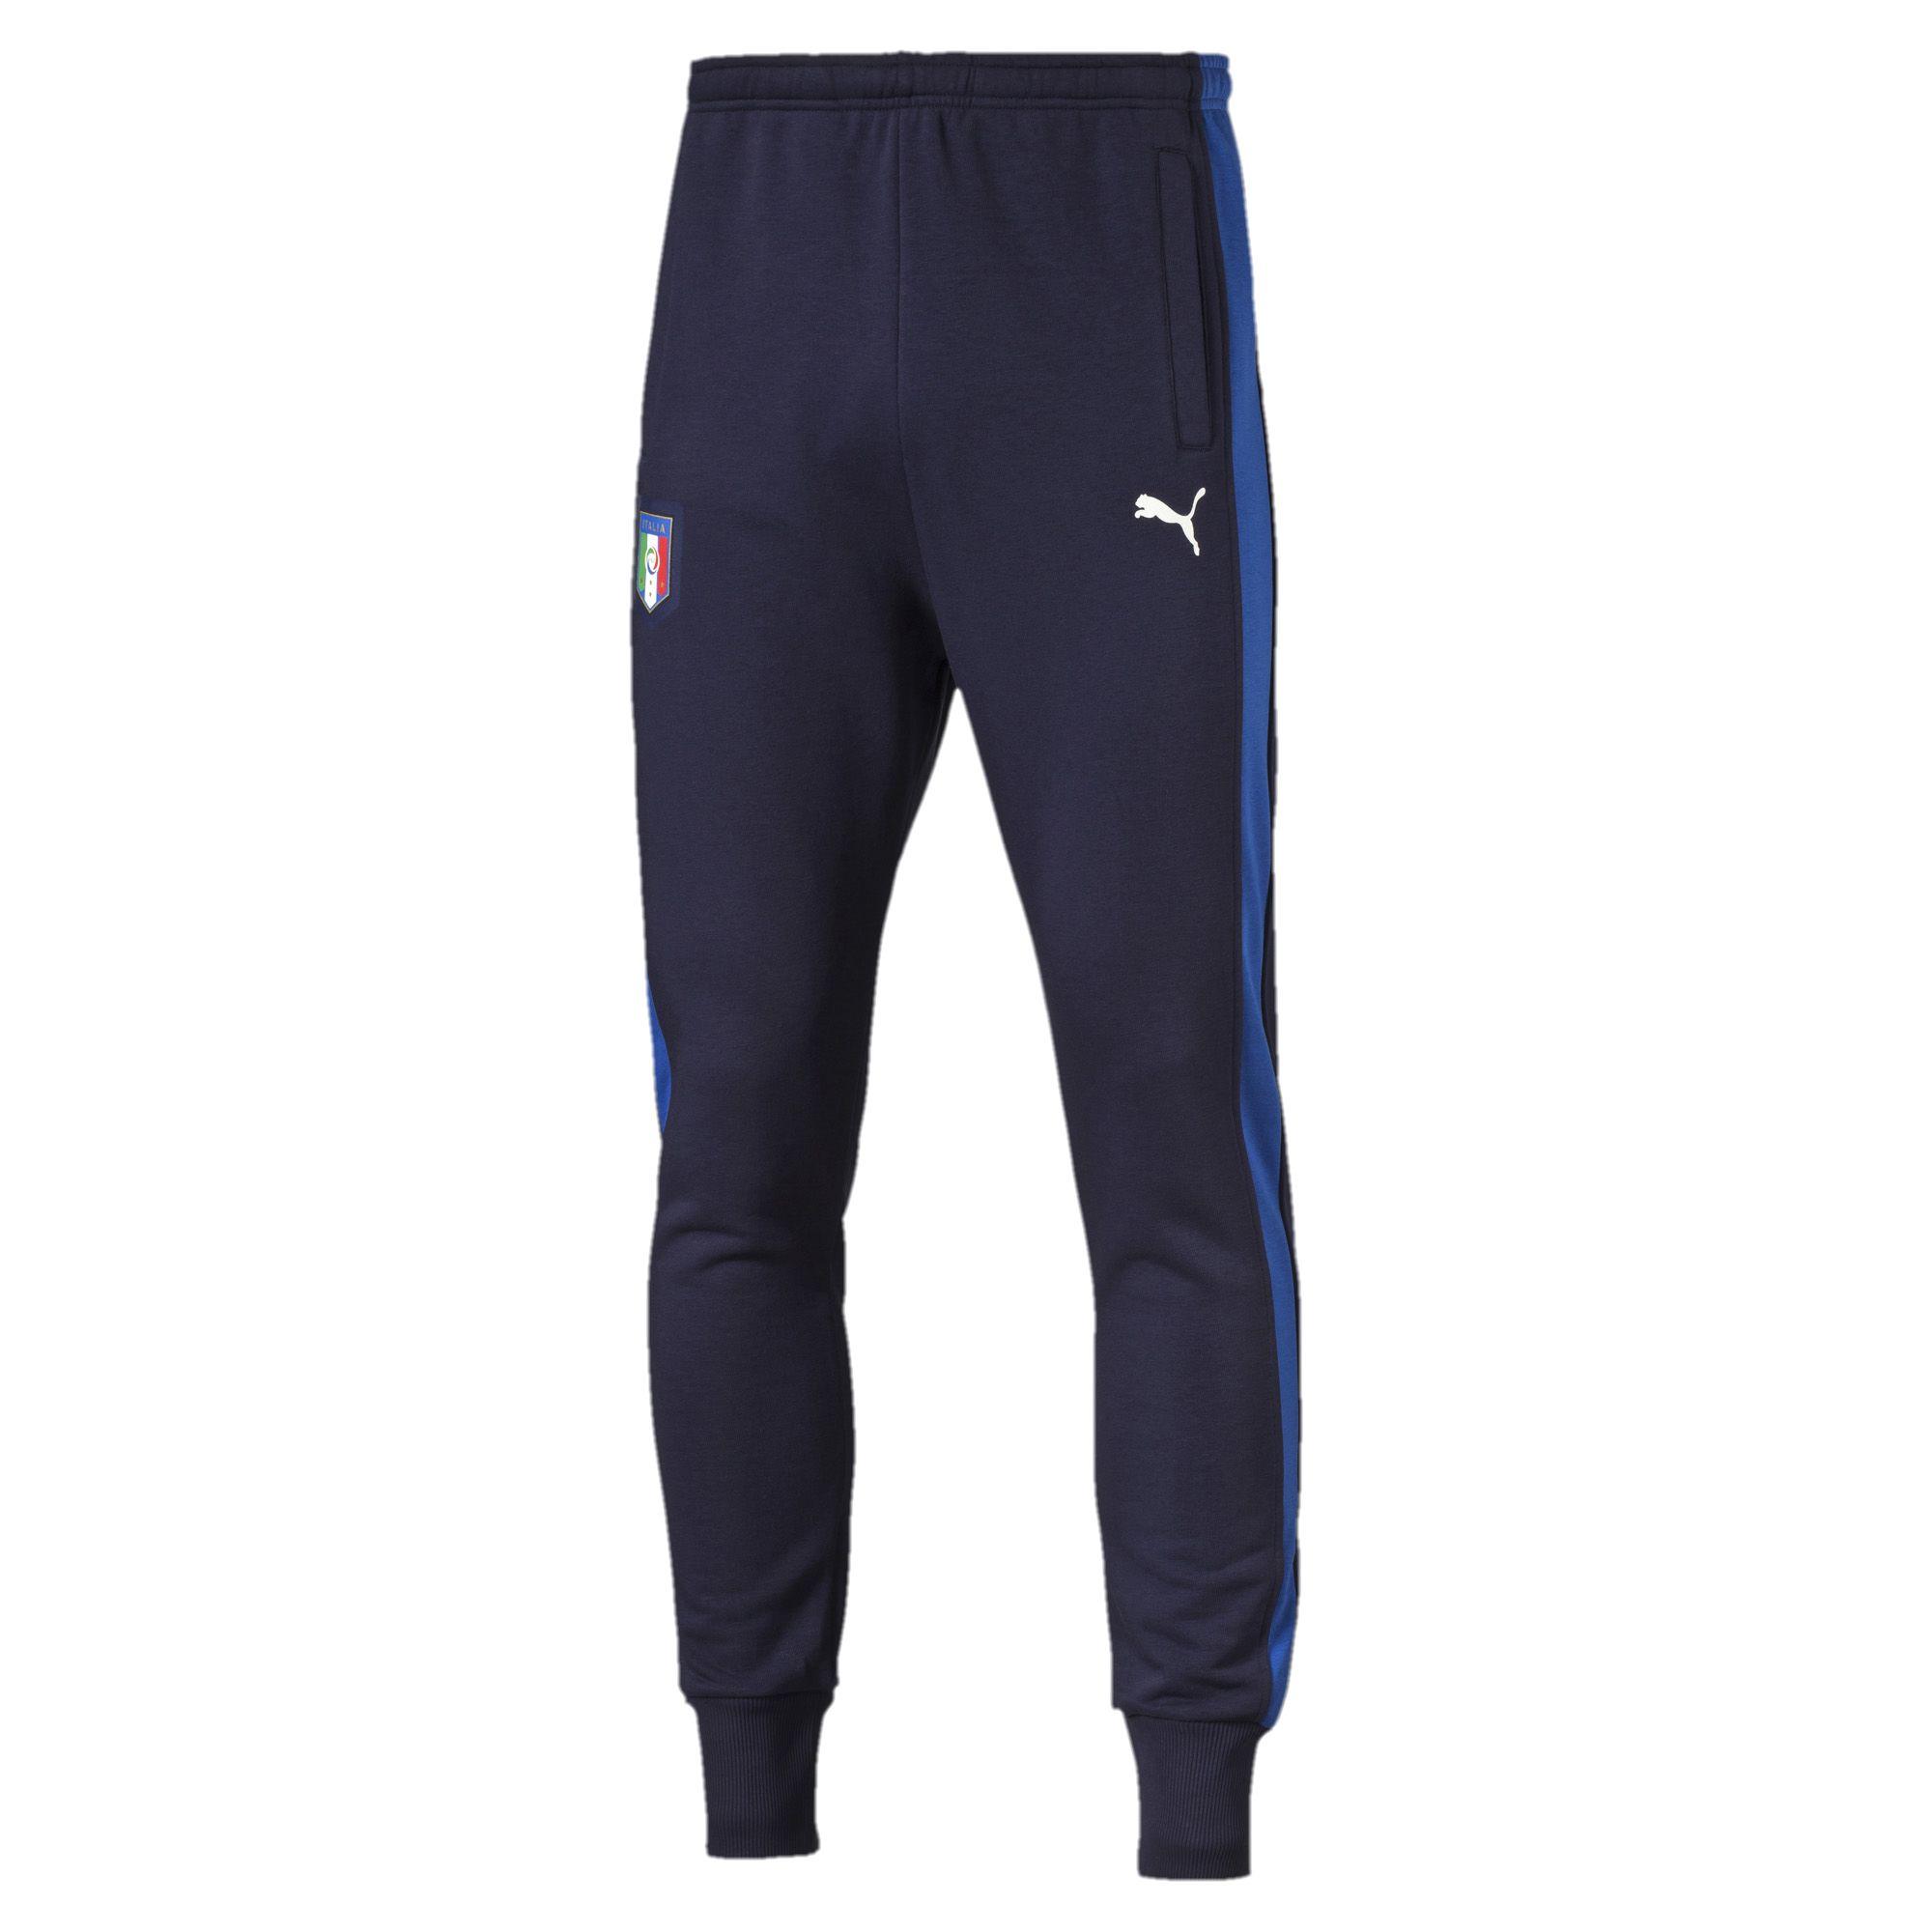 FIGC Italia TRIBUTE 2006 Pants